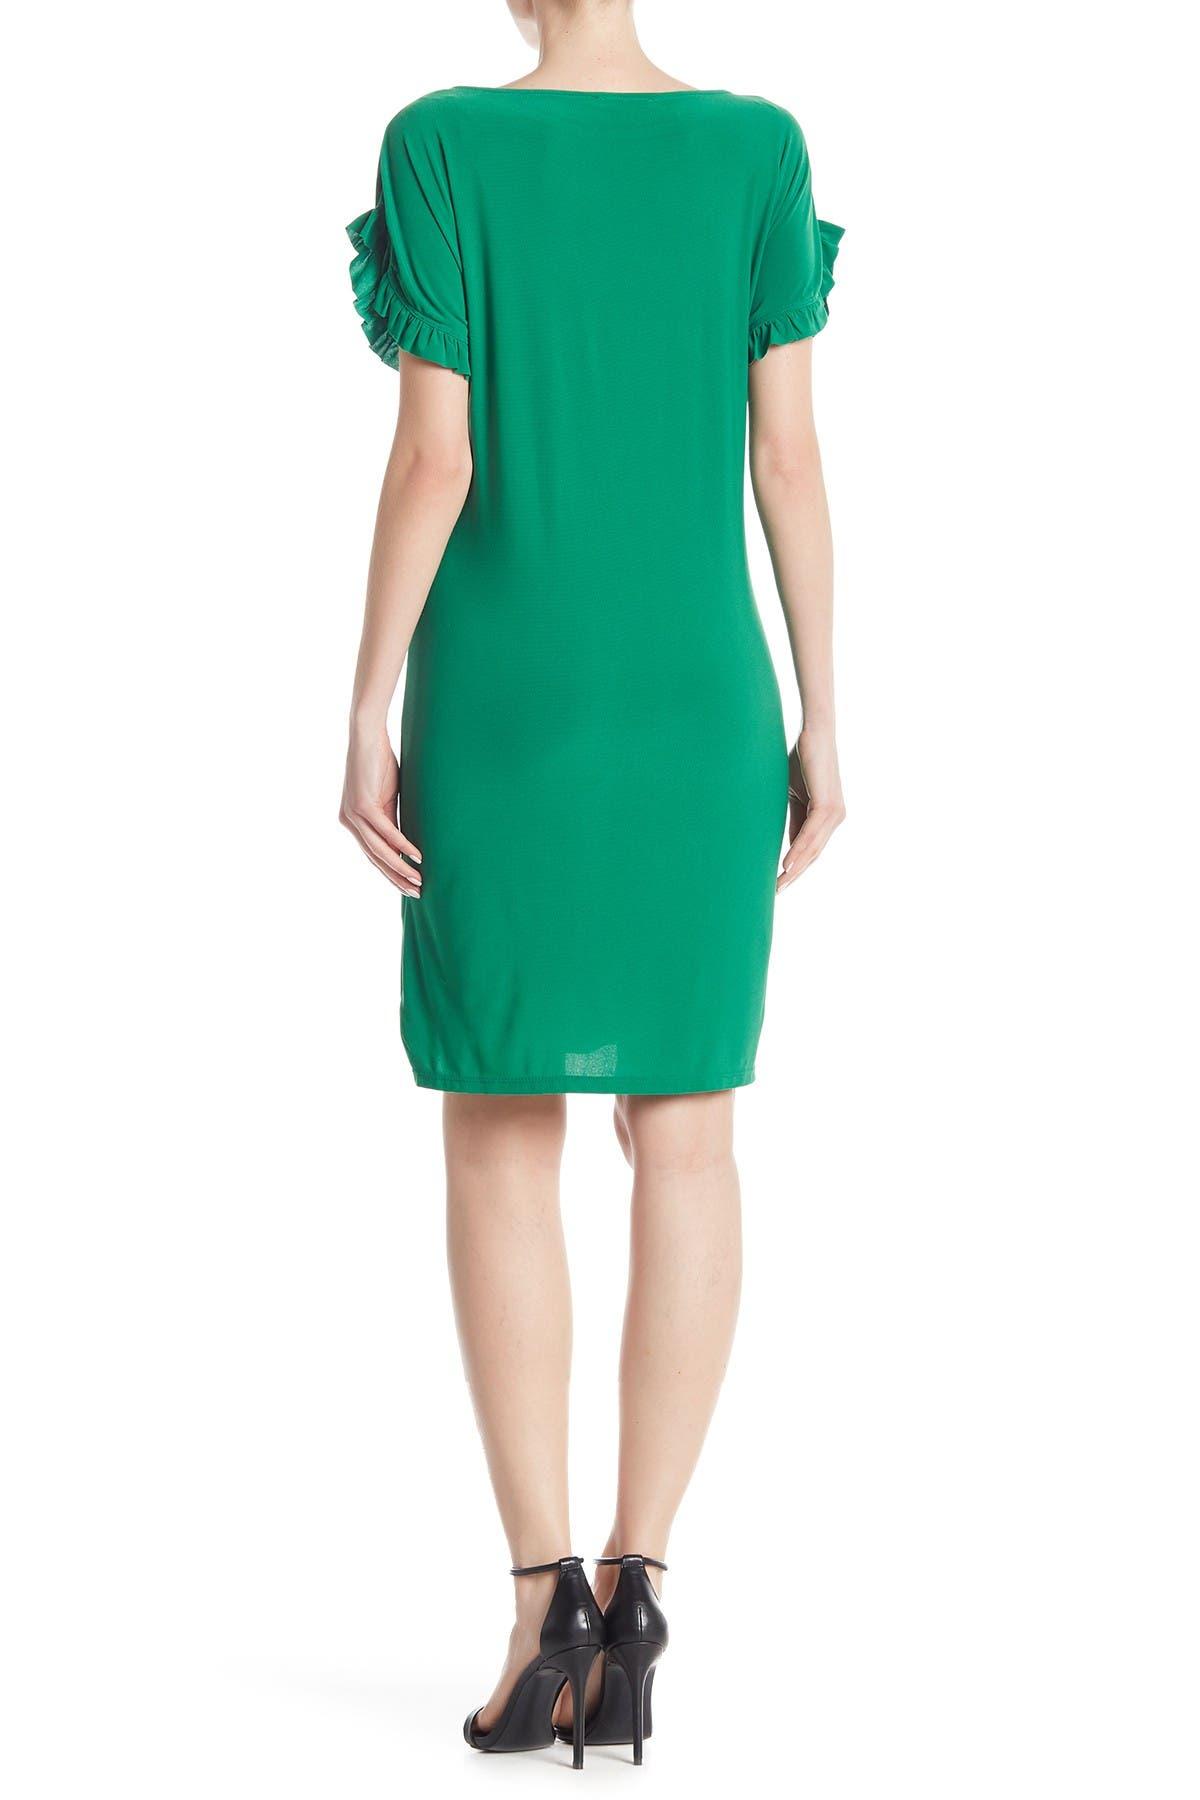 Image of TASH + SOPHIE Knit Ruffle Sleeve Dress